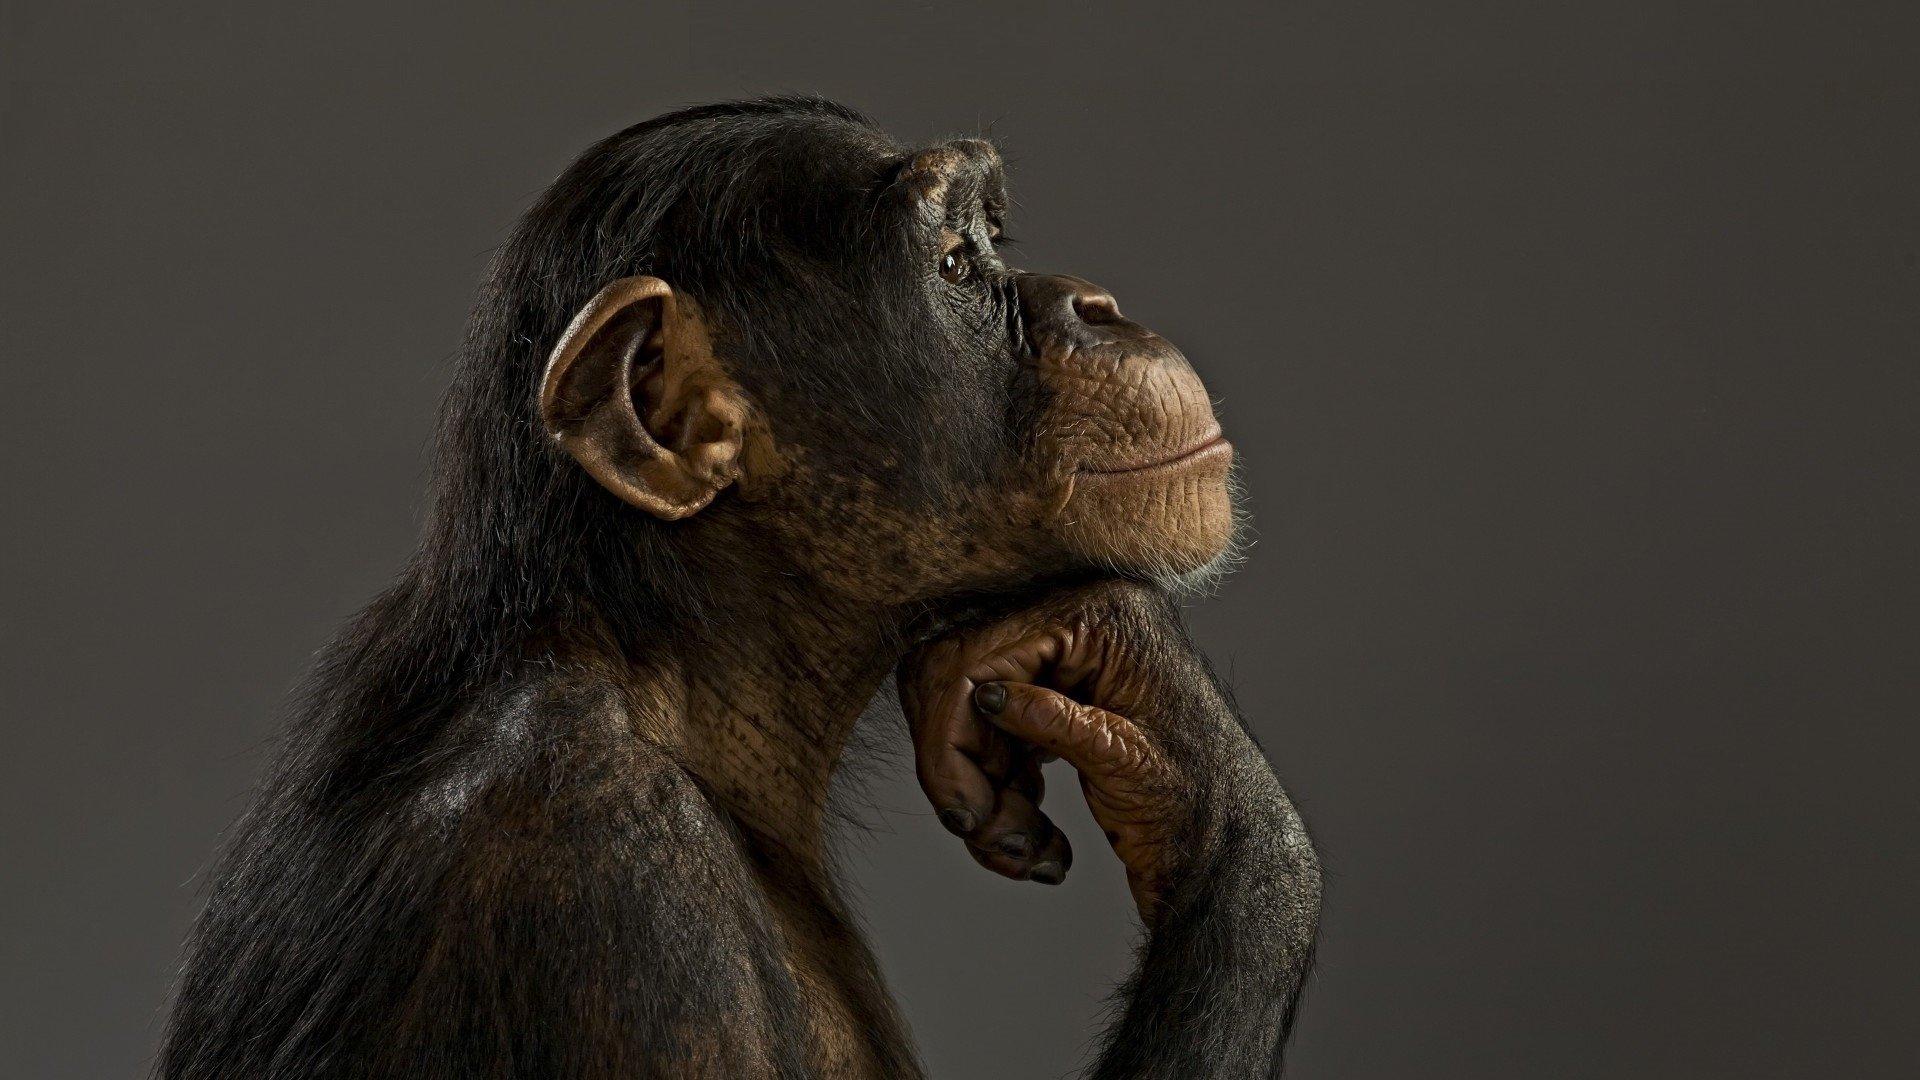 Monkey Wallpaper monkey wallpapers | wallpaperup